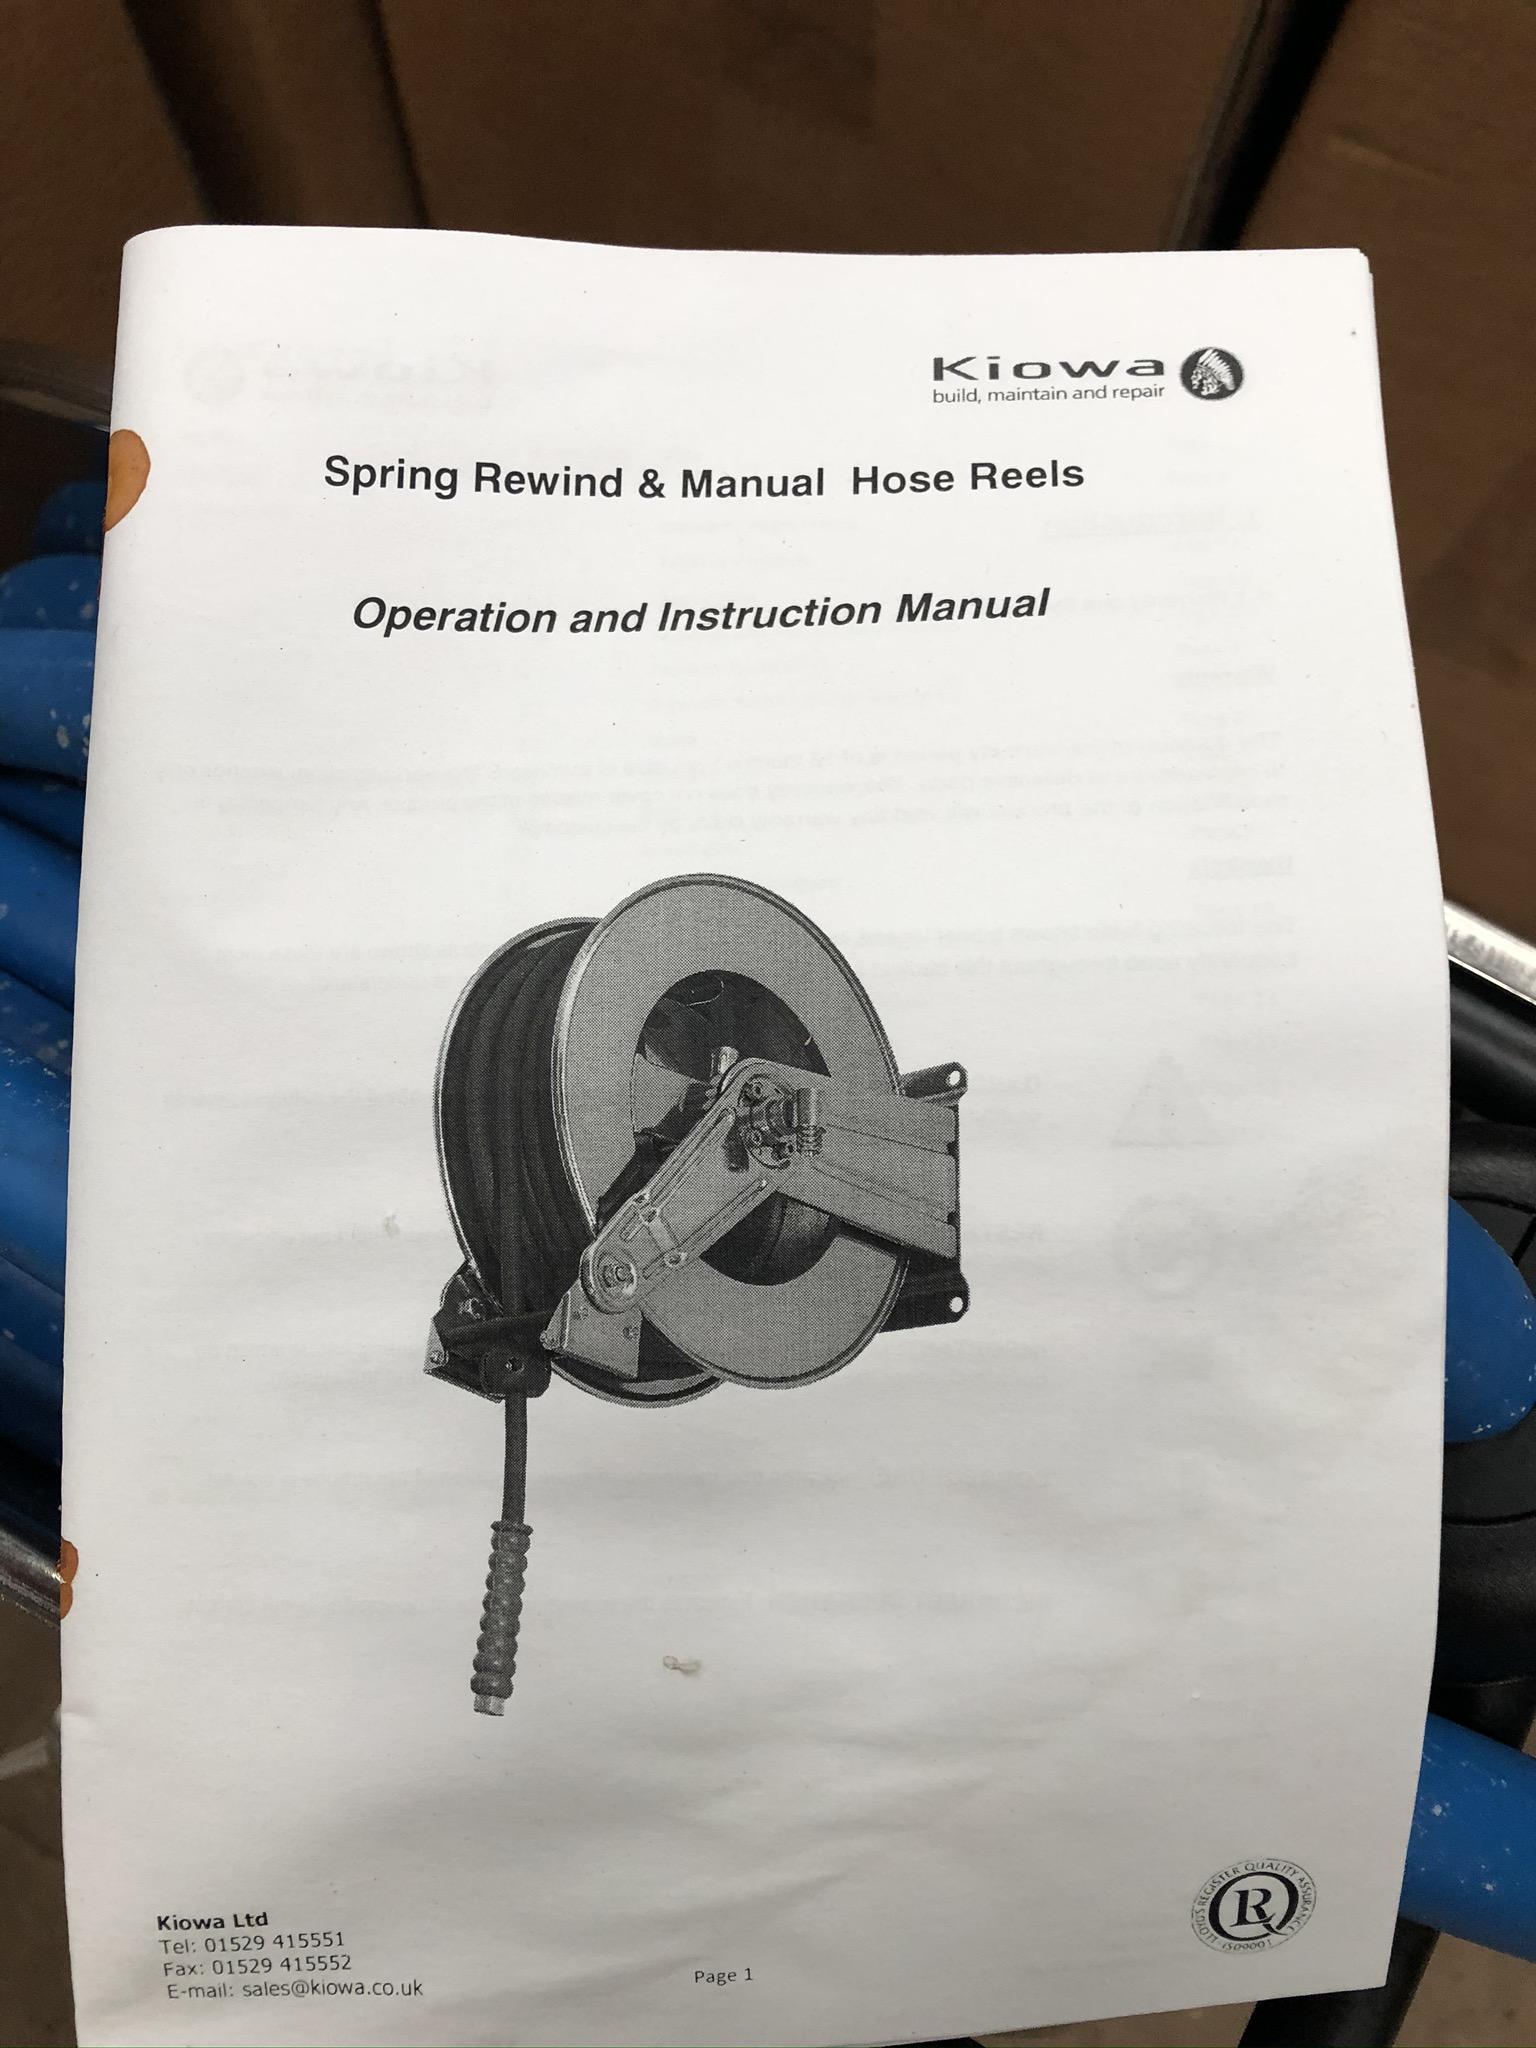 Lot 62 - Kiowa Spring Rewind & Manual Hose Reel, plant no.